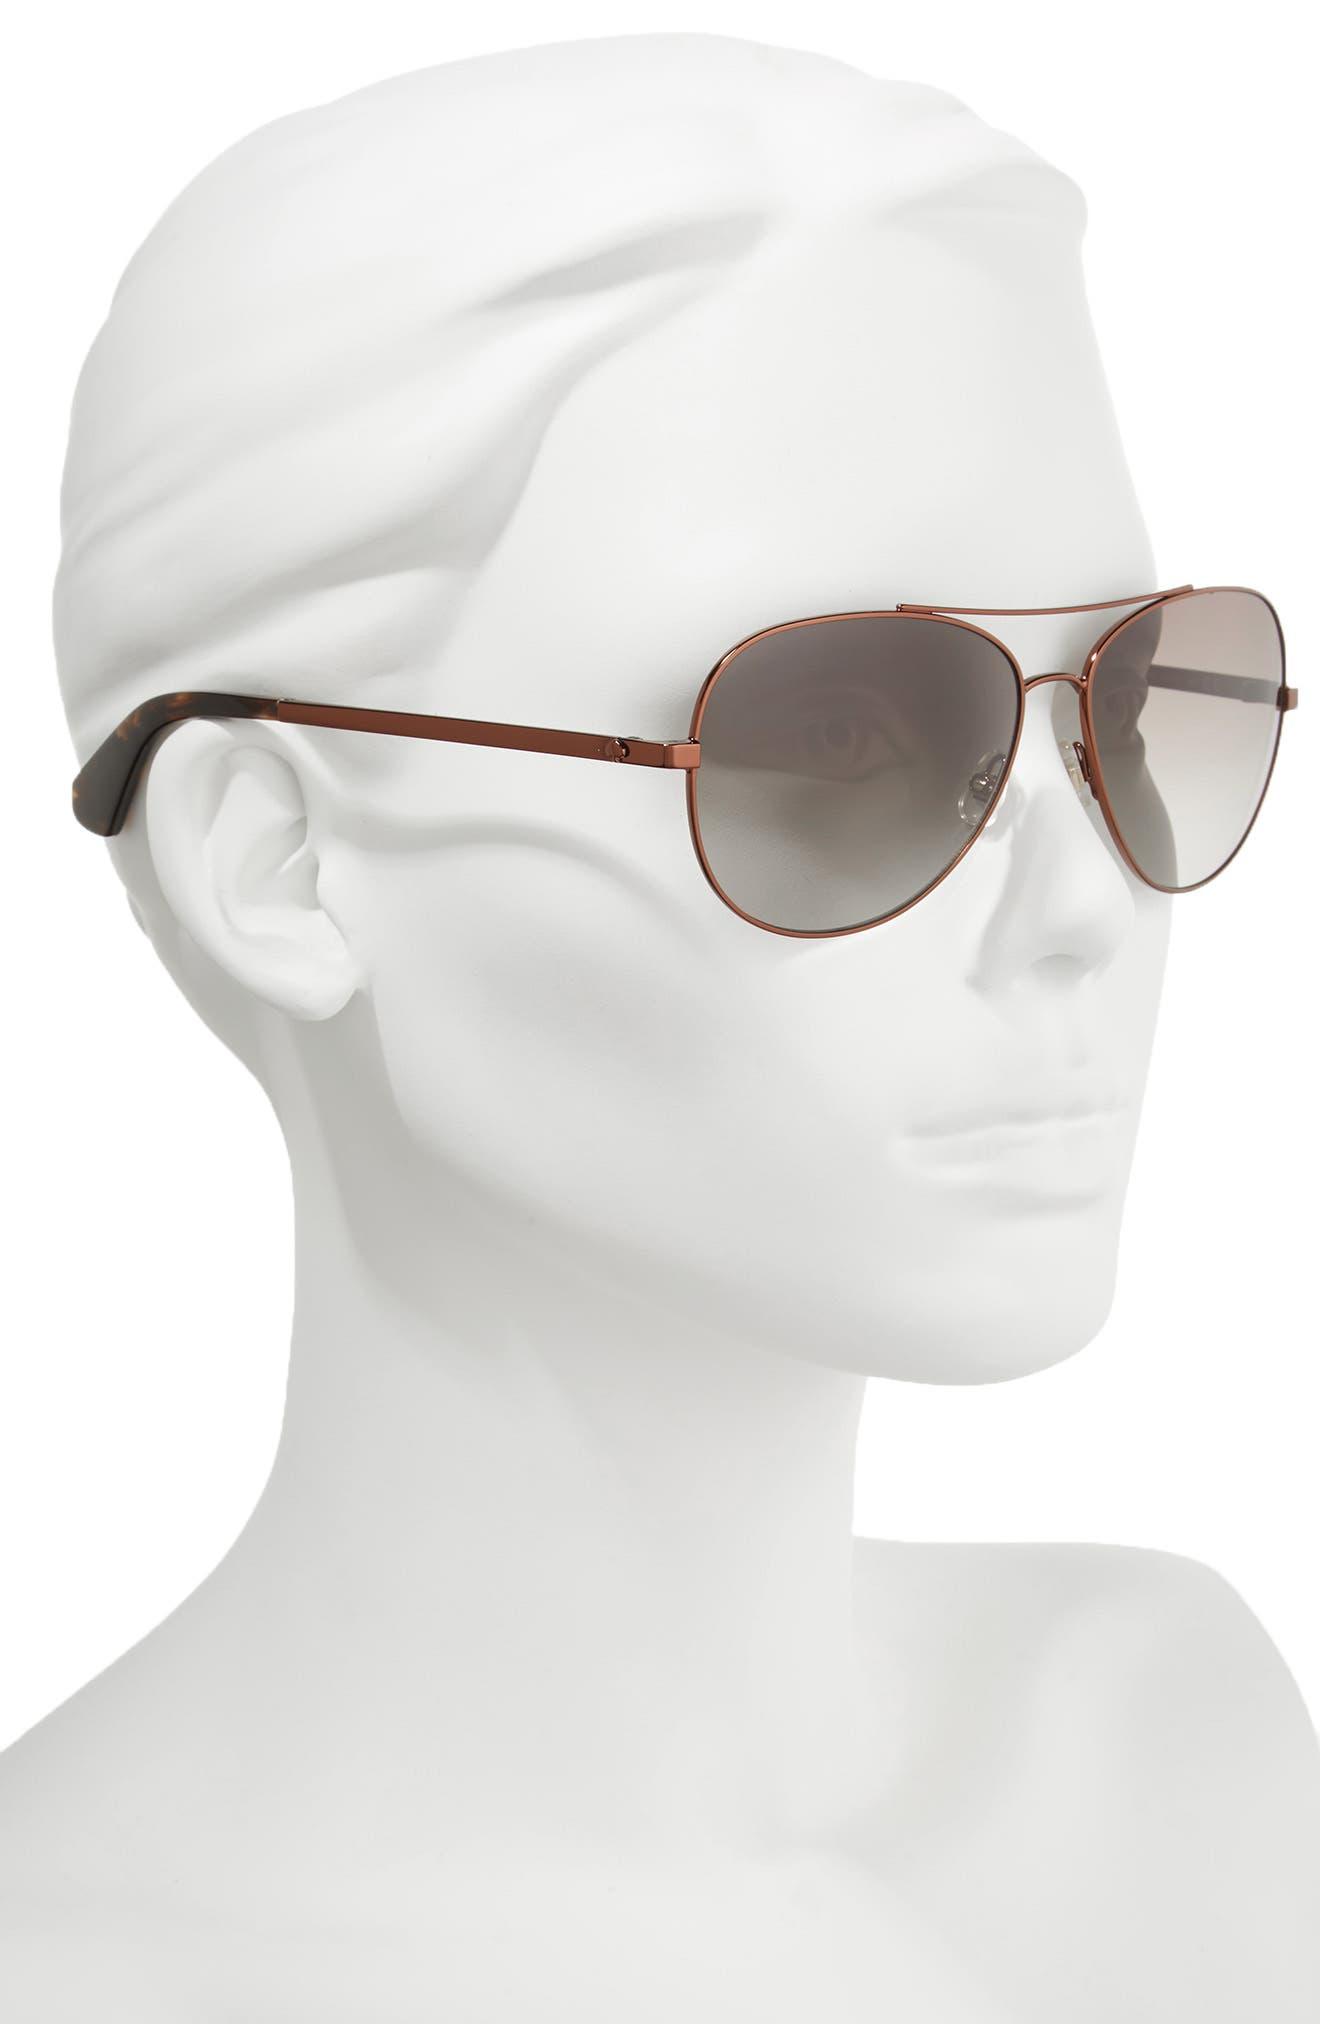 avaline 58mm aviator sunglasses,                             Alternate thumbnail 2, color,                             BROWN HAVANA